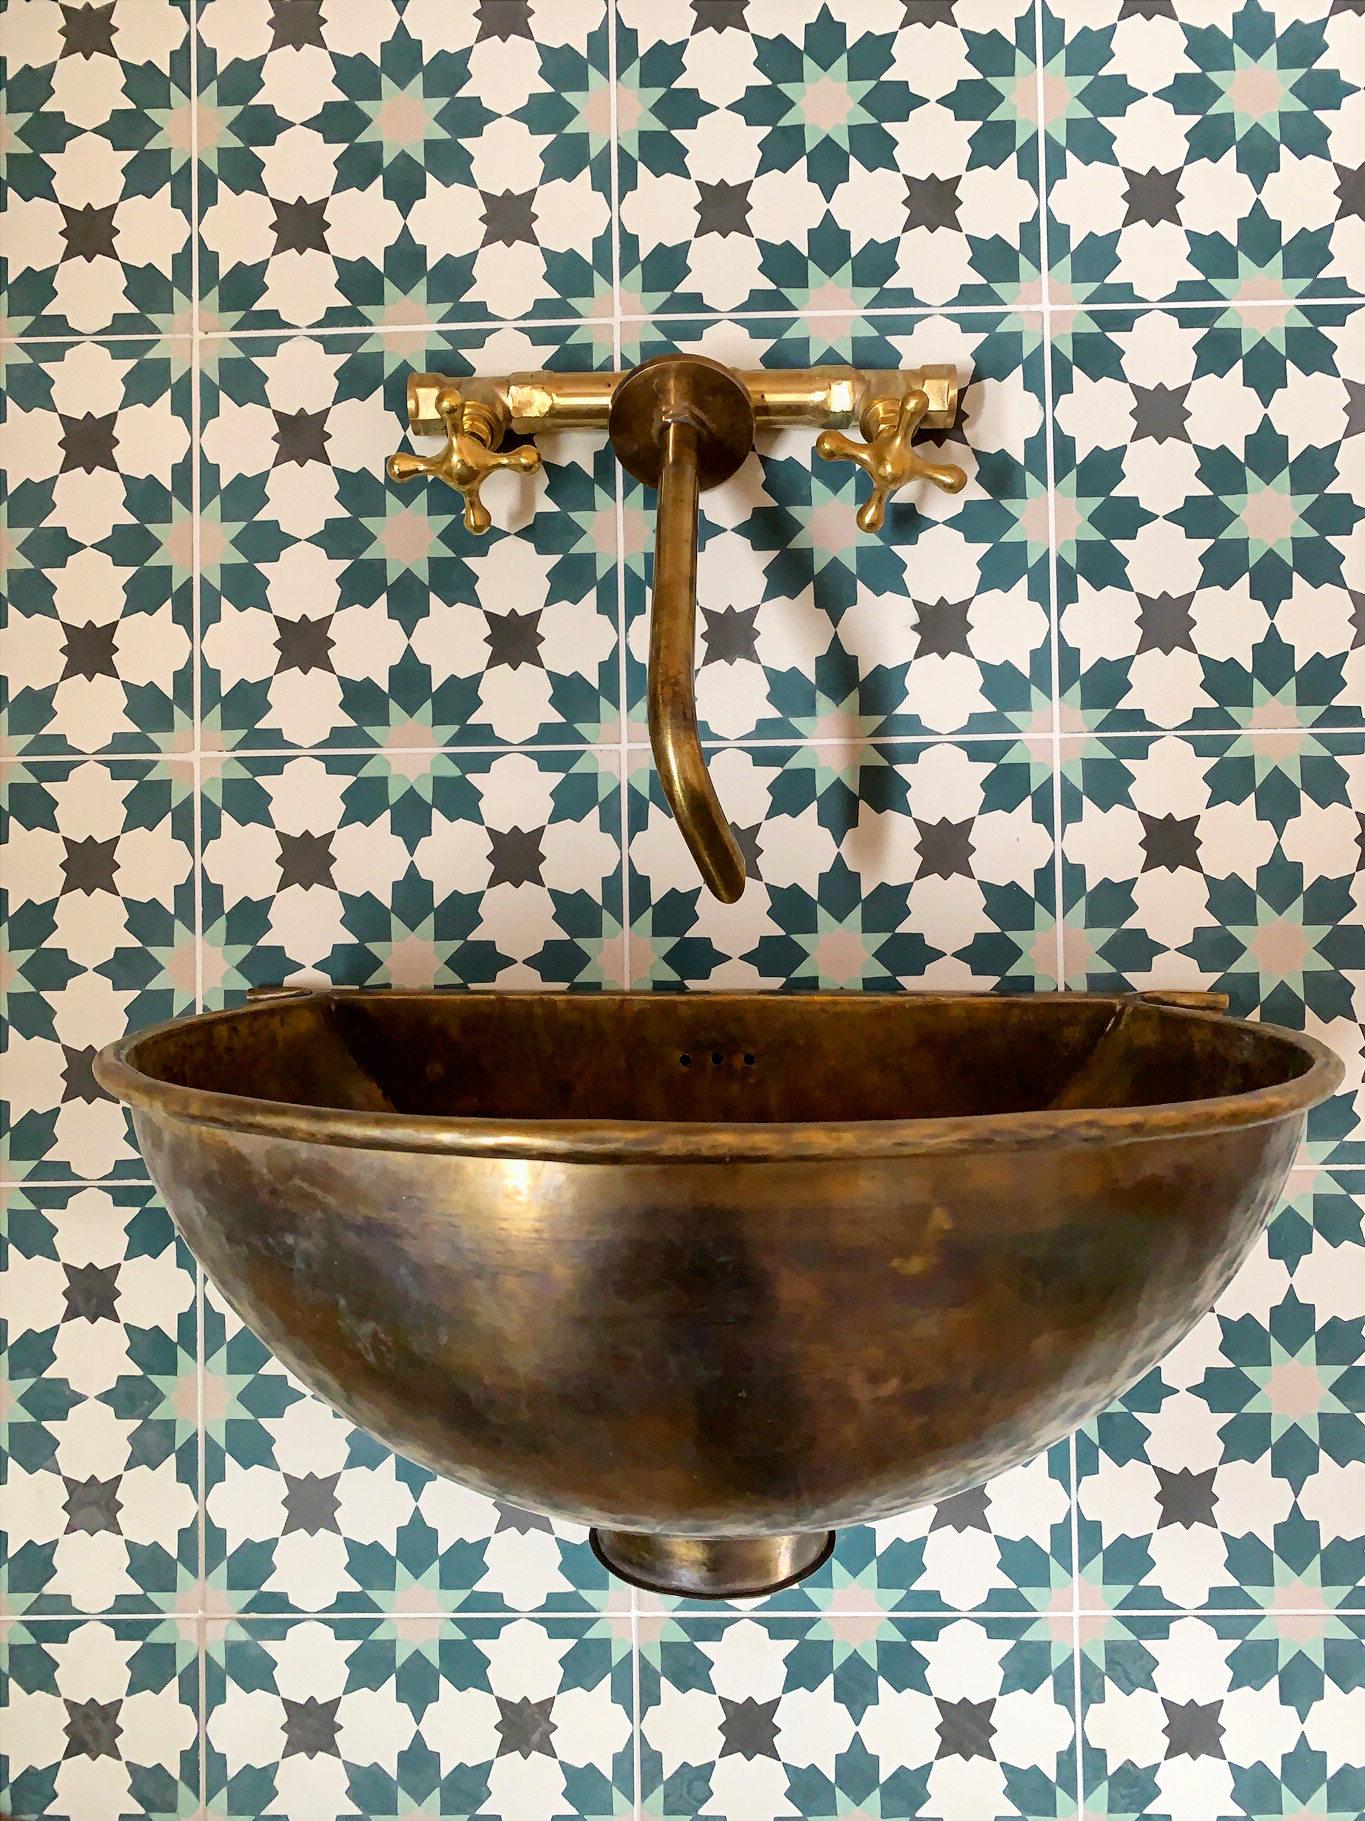 Sunny Sands House Tiles Sink